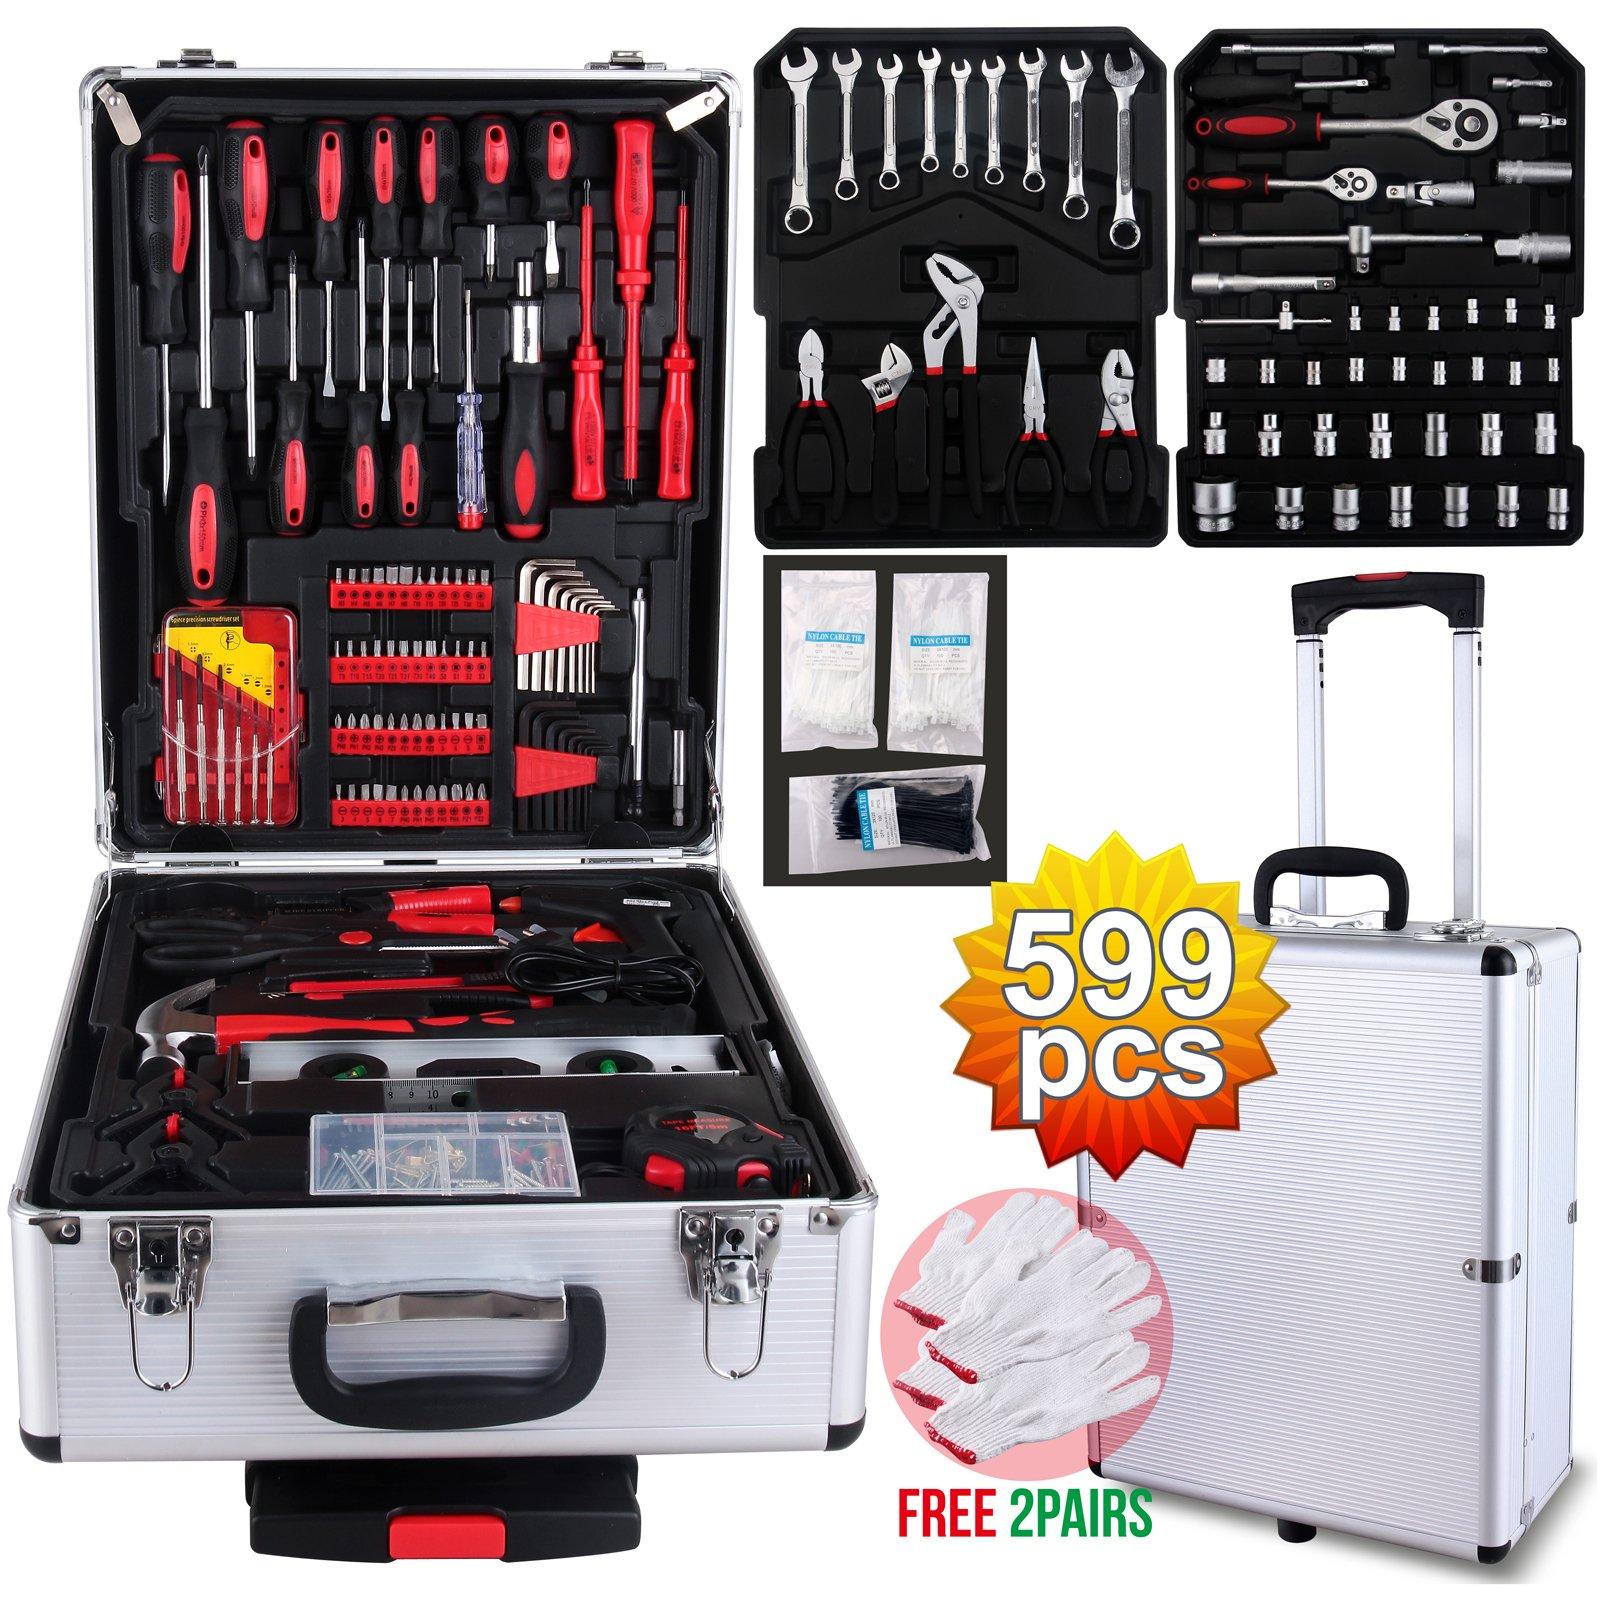 SUNCOO Mechanics Tool Set Standard Metric Hand Tool Kit with Case Box Organize Castors Trolley (599 Pcs w/Silver Case)